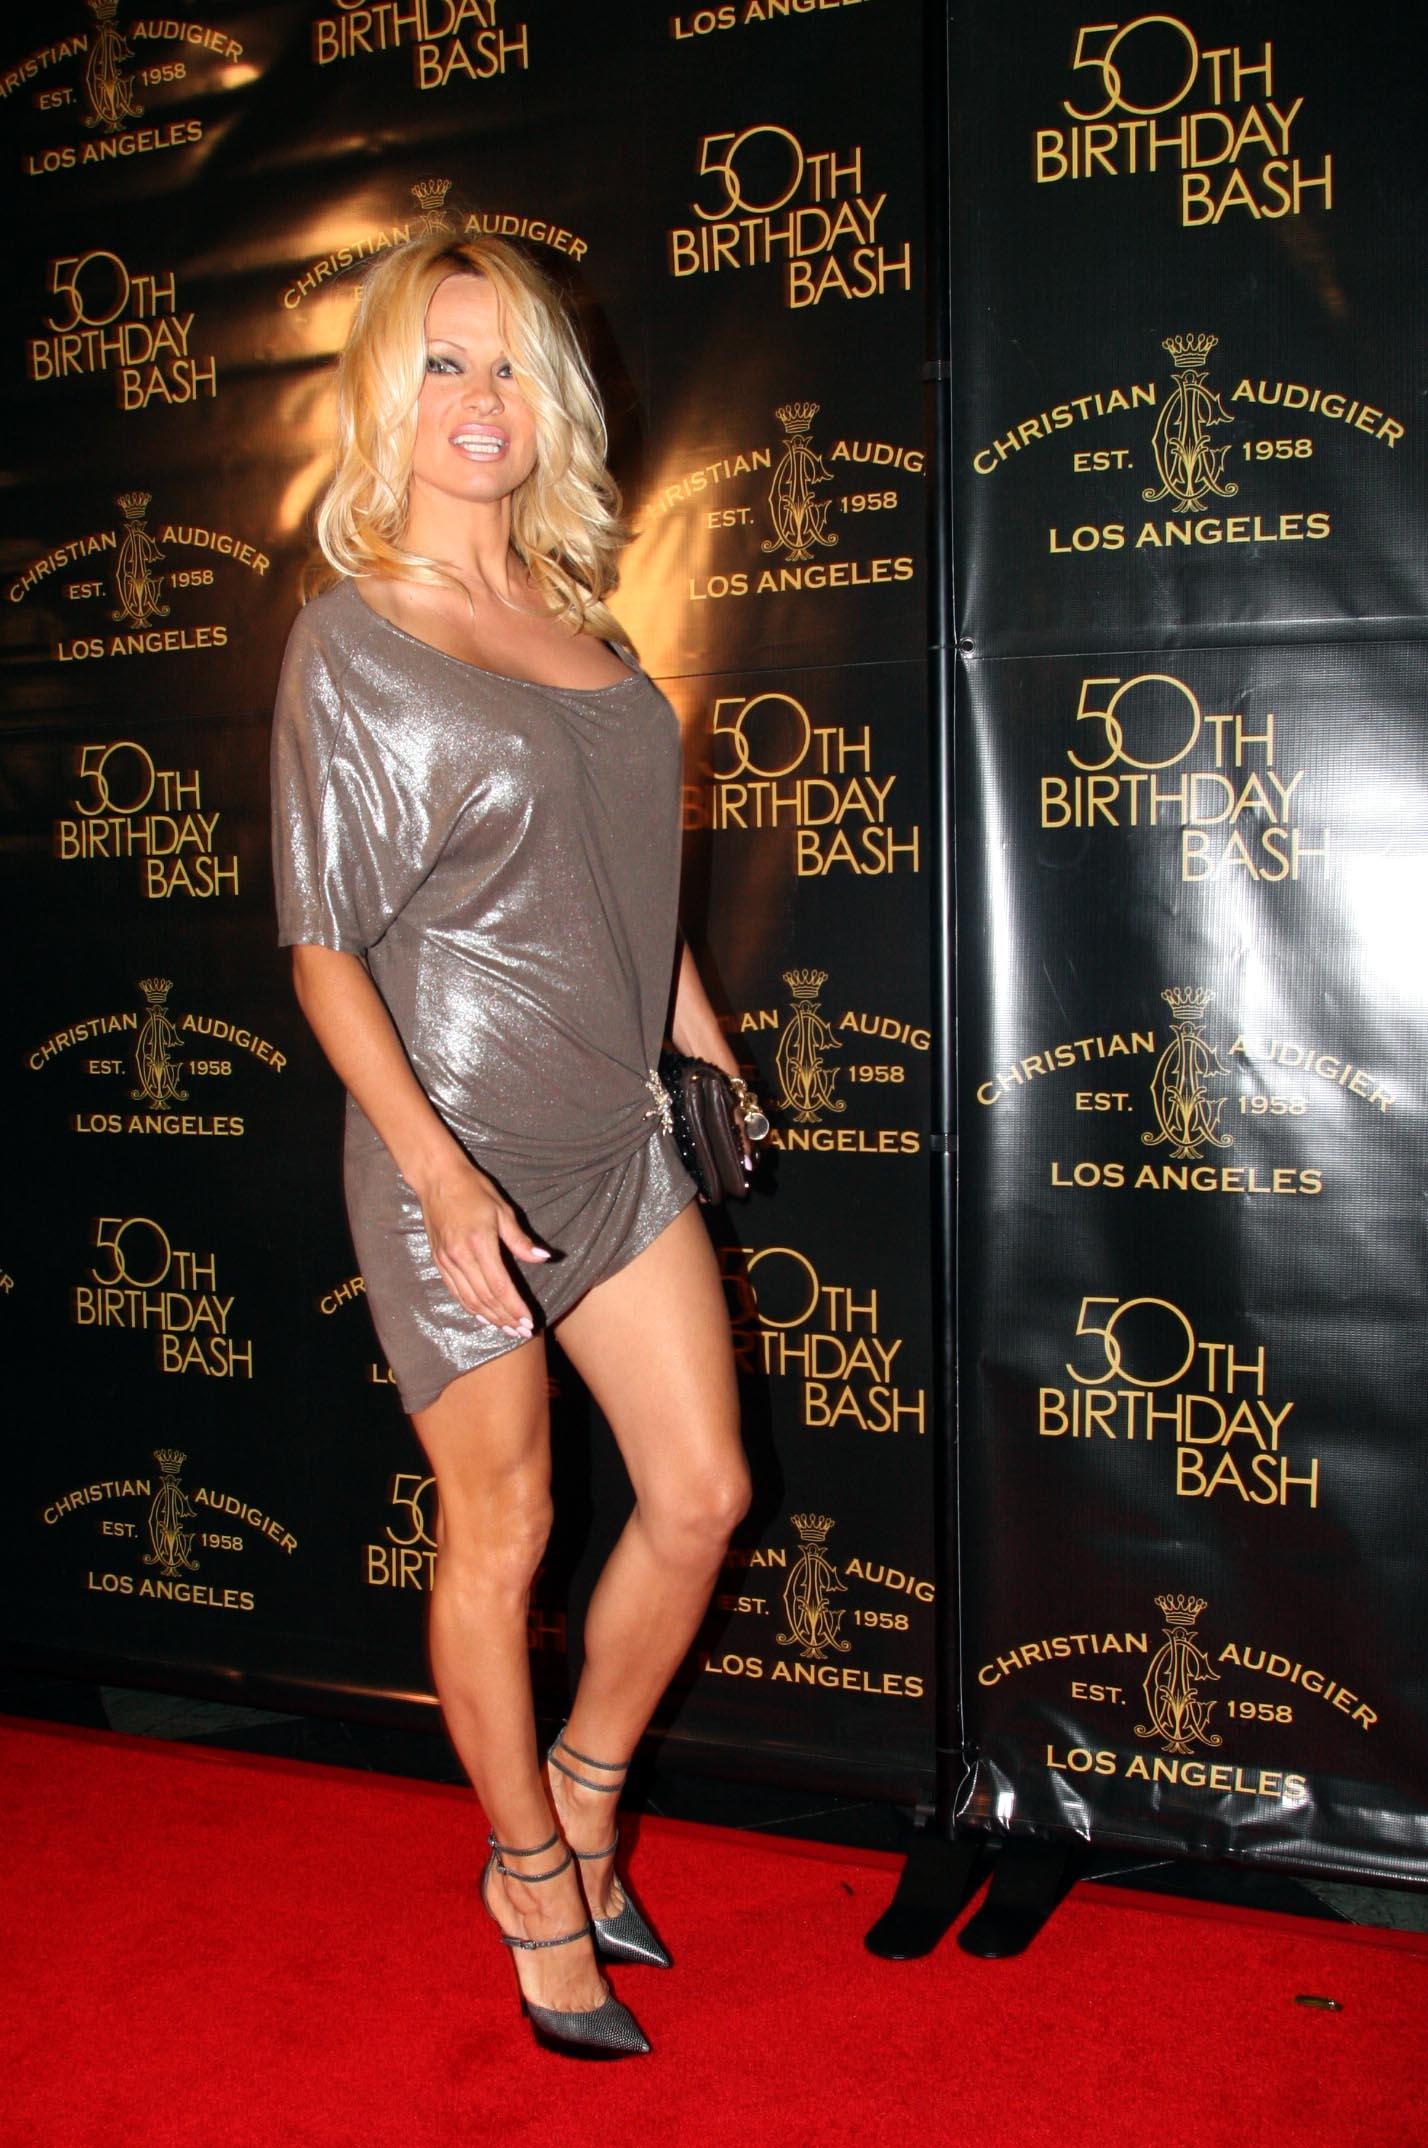 49312_Celebutopia-Pamela_Anderson-Designer_Christian_Audigier39s_50th_Birthday_Bash-04_122_997lo.jpg